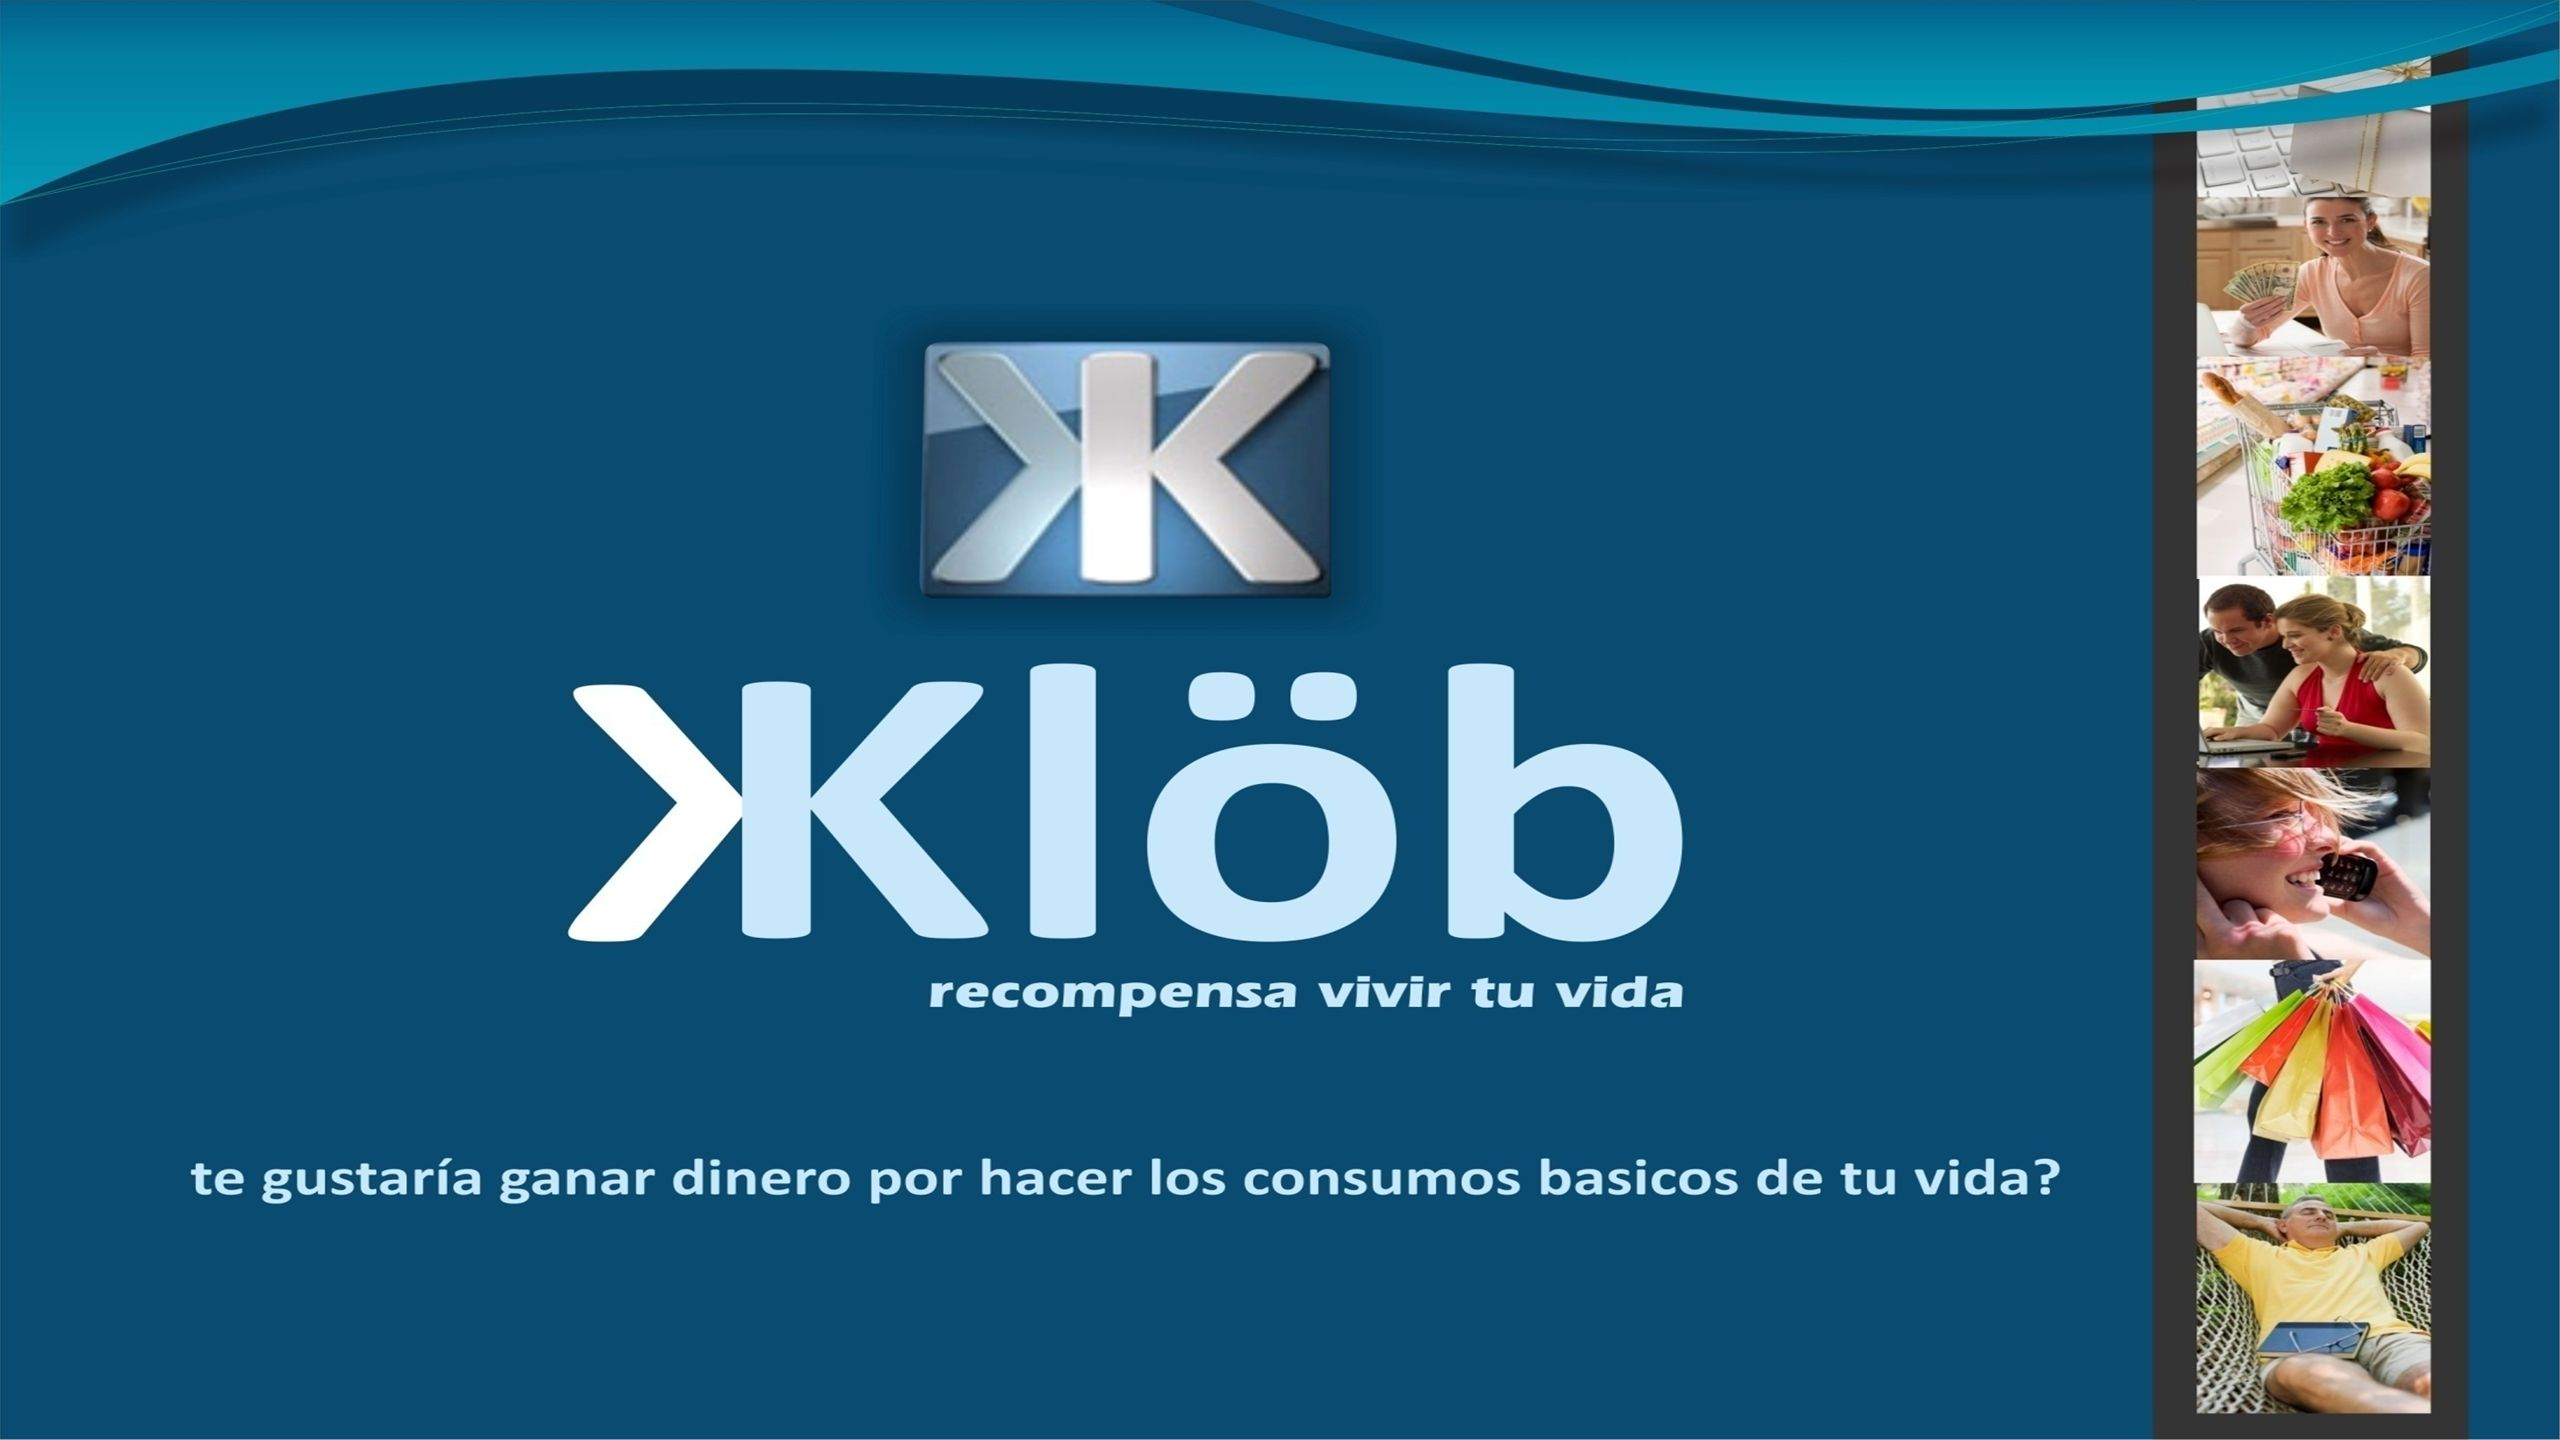 Empresa mexicana que inicia operaciones el 5 de Mayo del 2010.